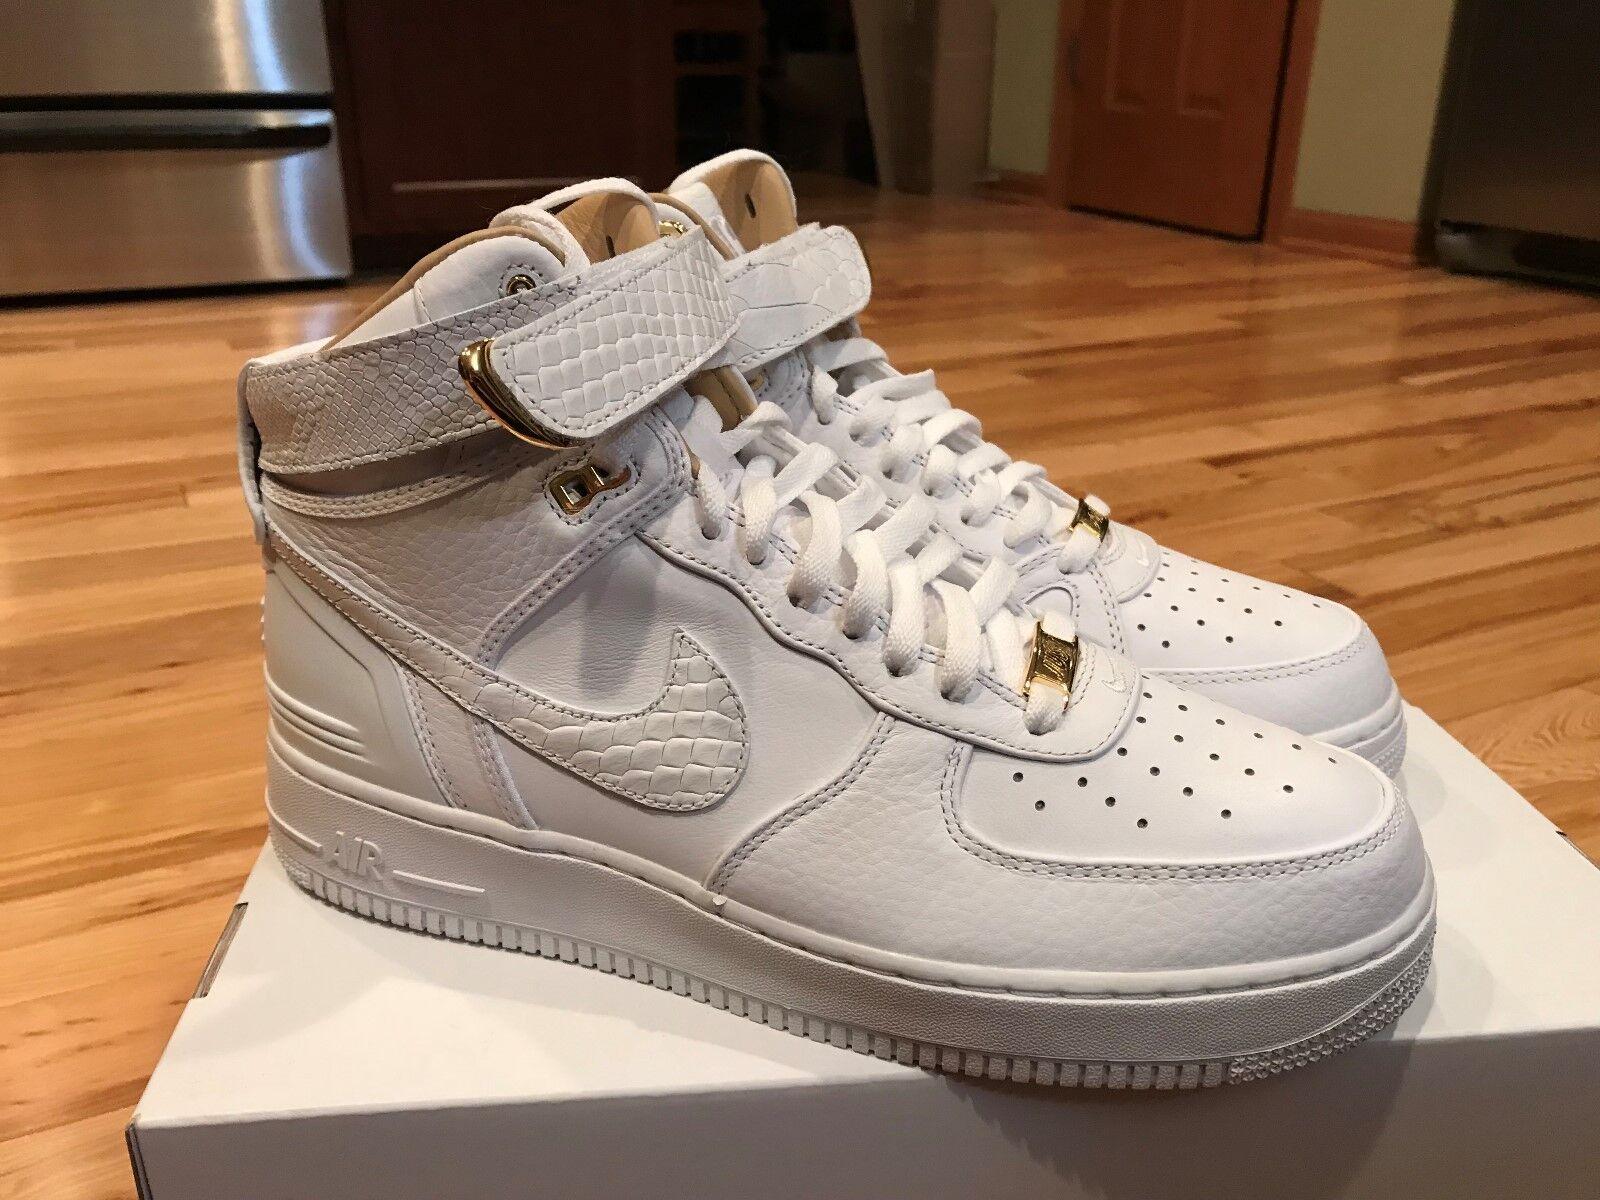 Nike Air Force 1 Hi Just Don White Gold AO1074-100 Men's Size 10.5 NOBOXTOP